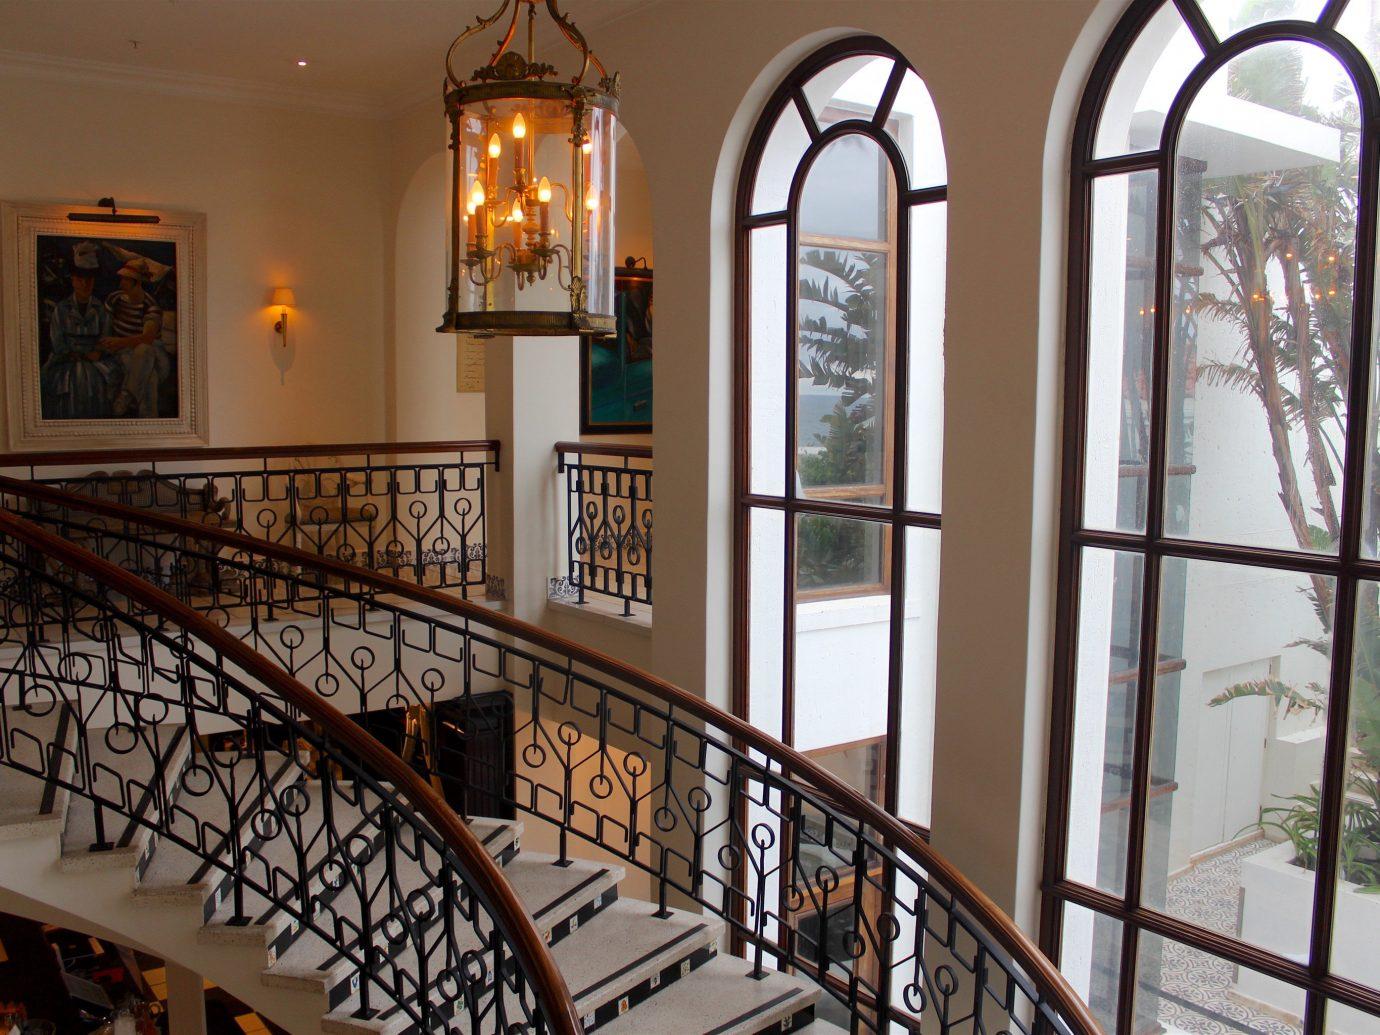 Hotels indoor Architecture estate arch window interior design glass dining room